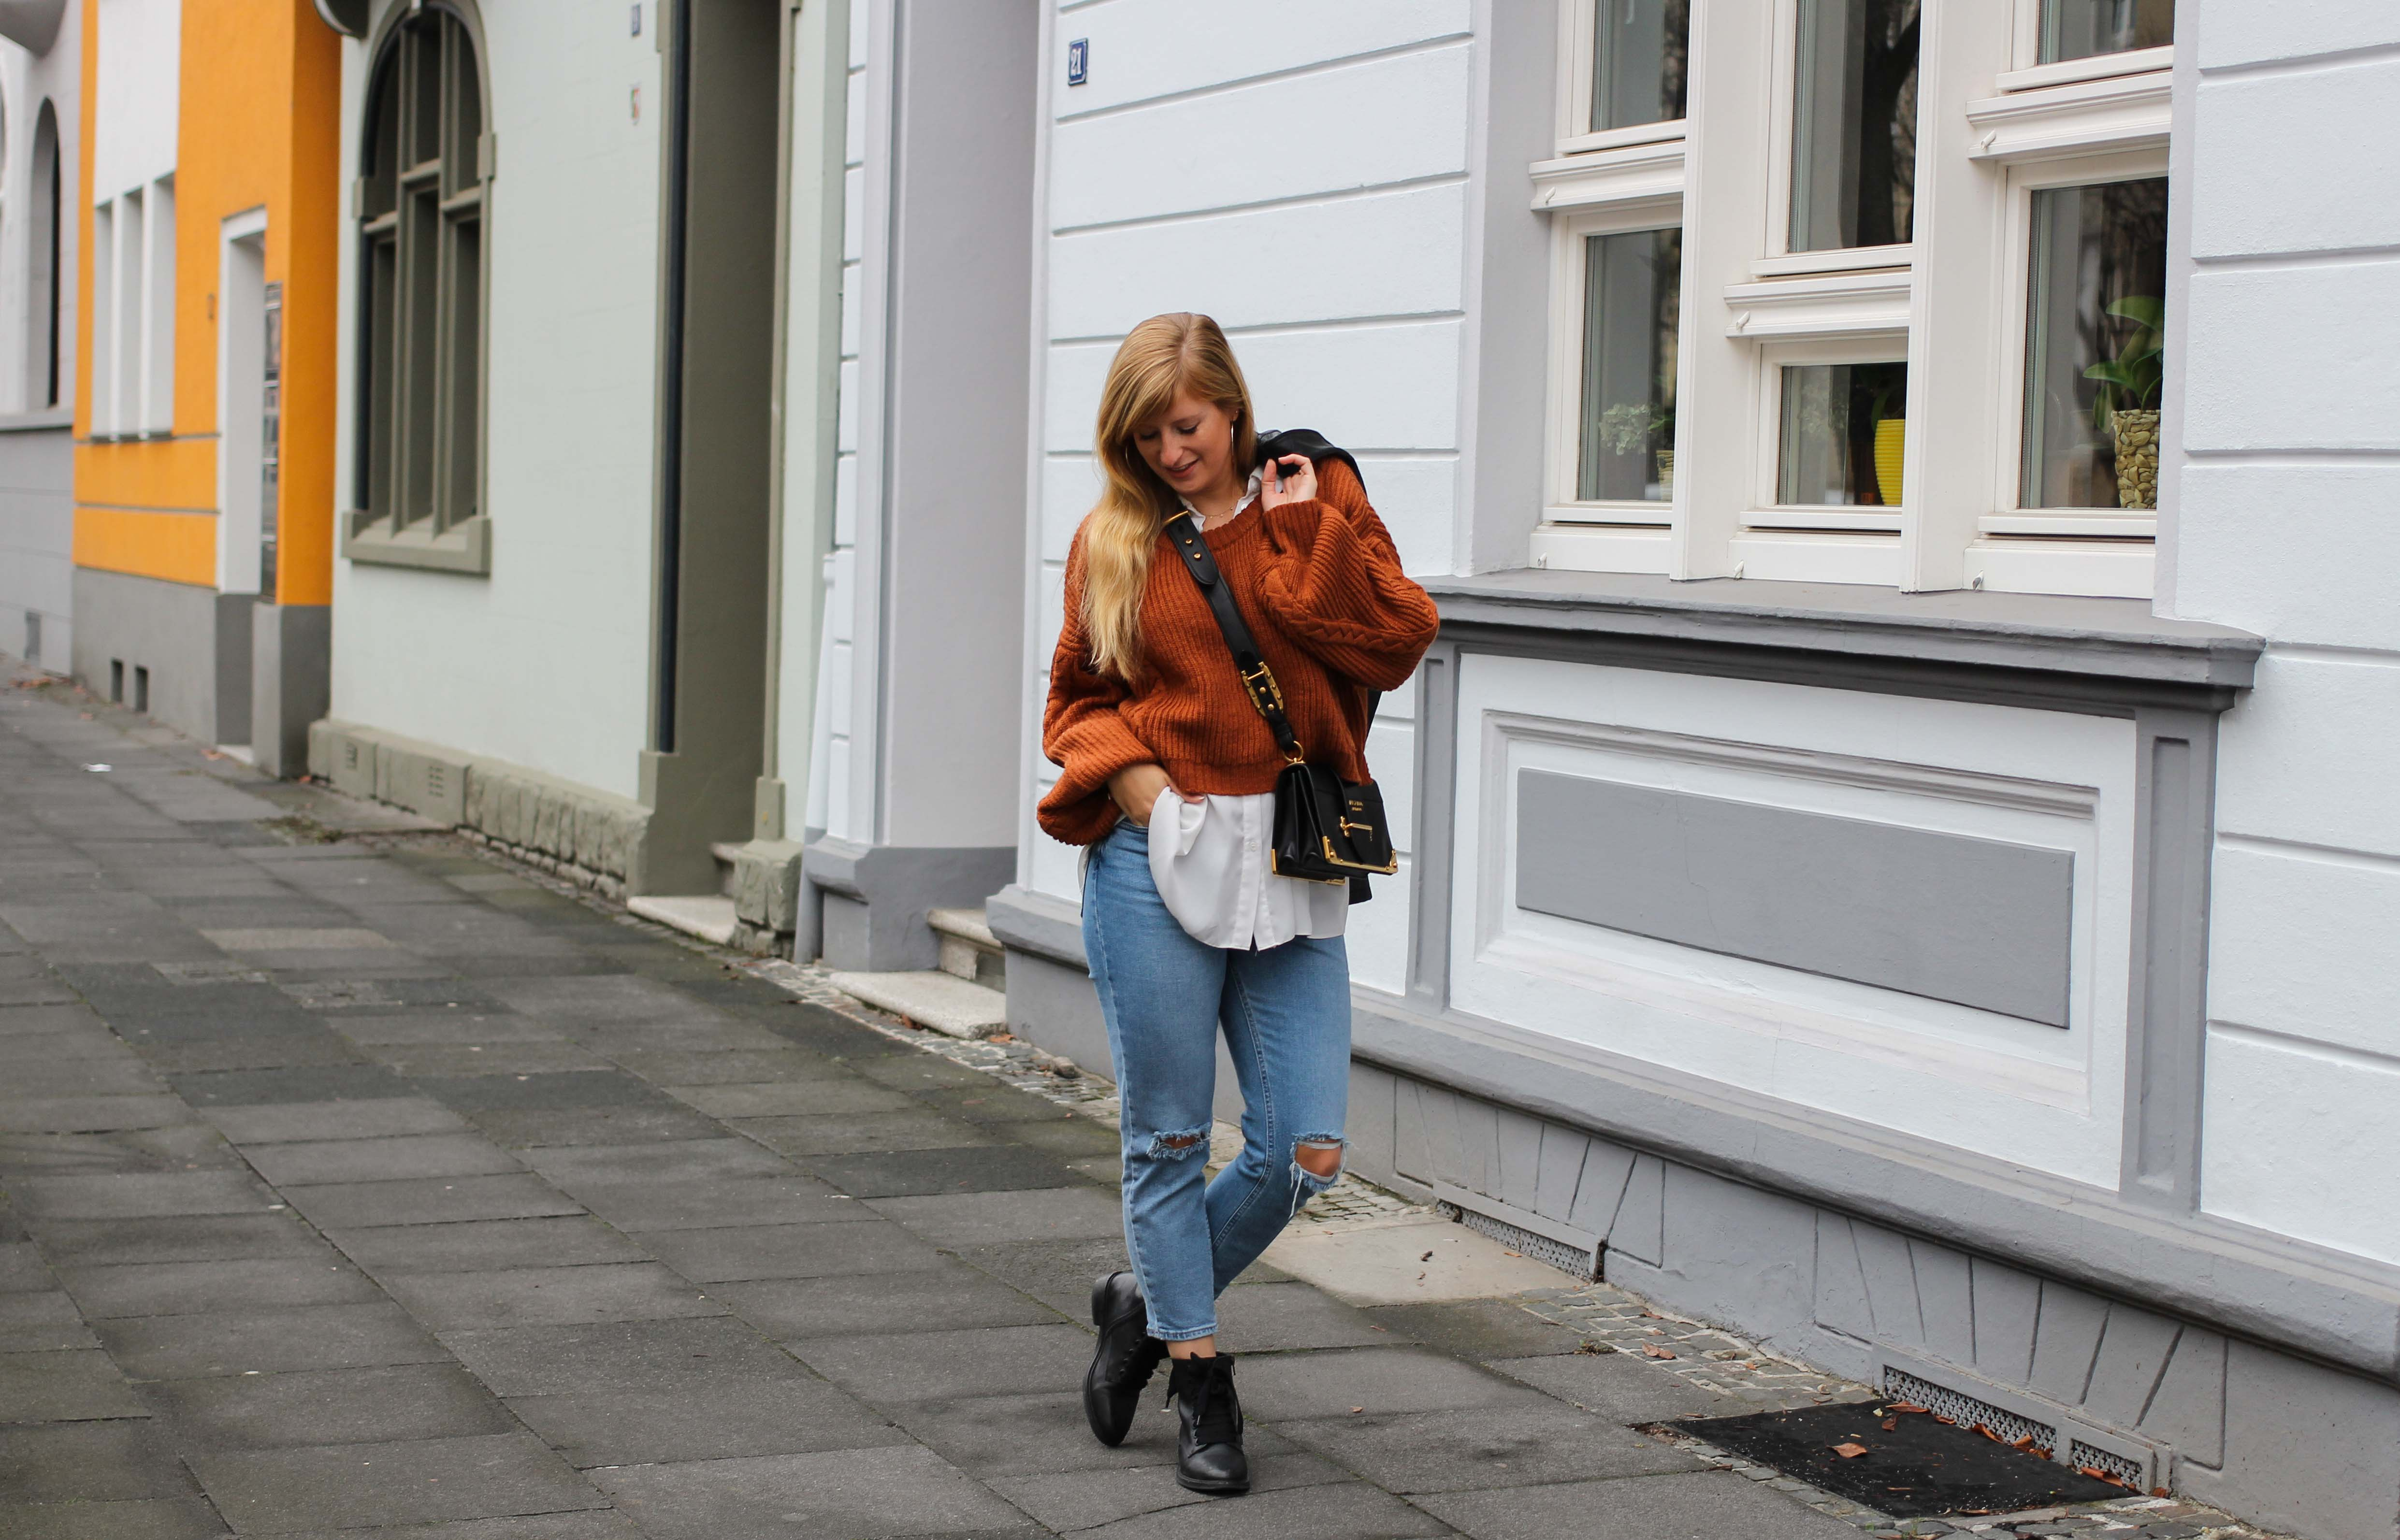 Übergangslook Crop Wollpullover Layering Bluse kombinieren zerrissene Jeans Modeblog Outfit Streetstyle Köln 7